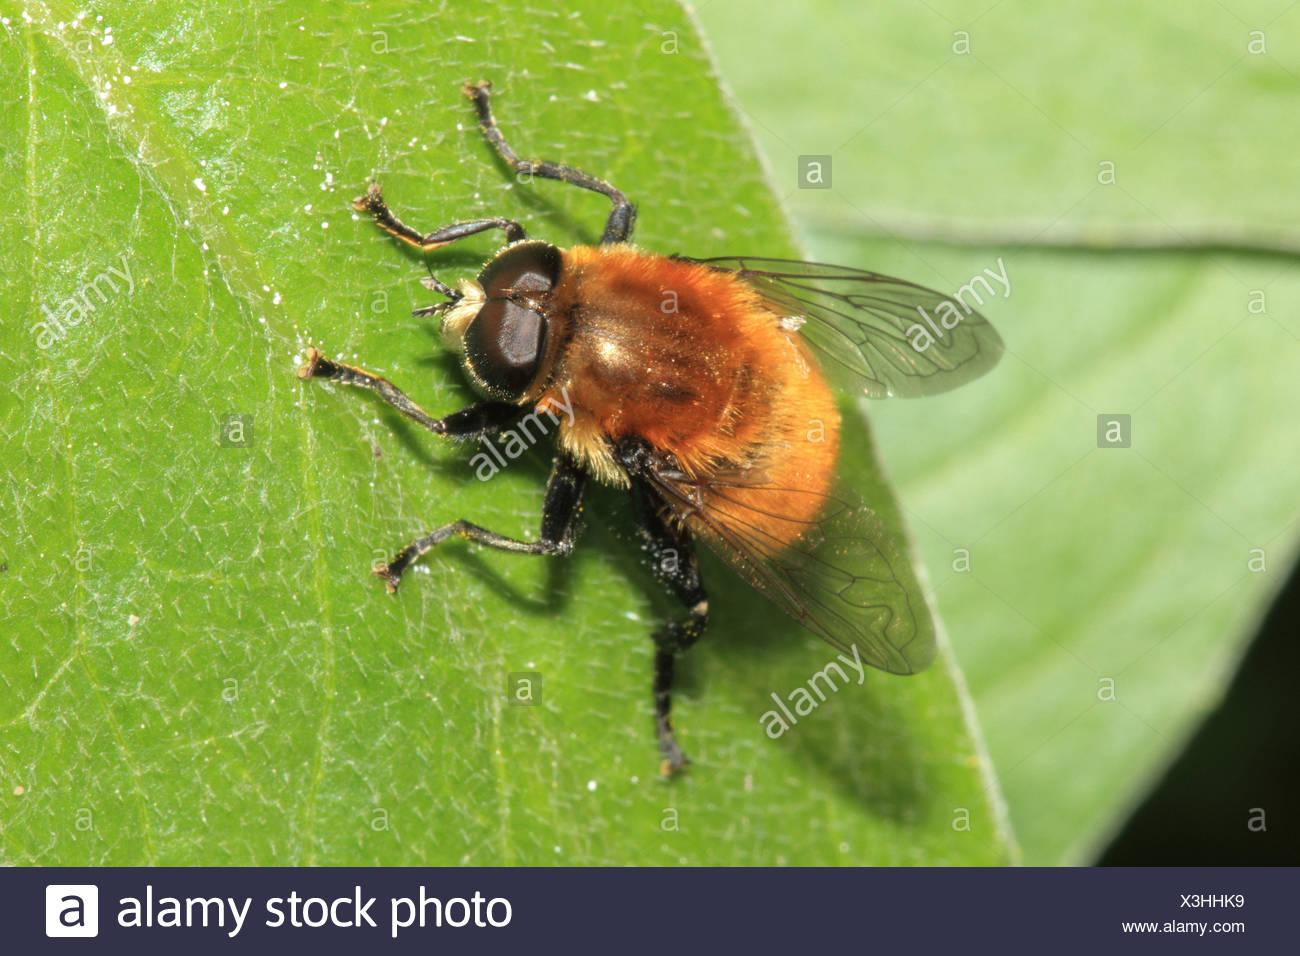 Yellow-hairy Hummelschwebfliege, leaves, medium close-up, landscape format, animal, wild animal, Hummelschwebfliege, fly, insect, - Stock Image